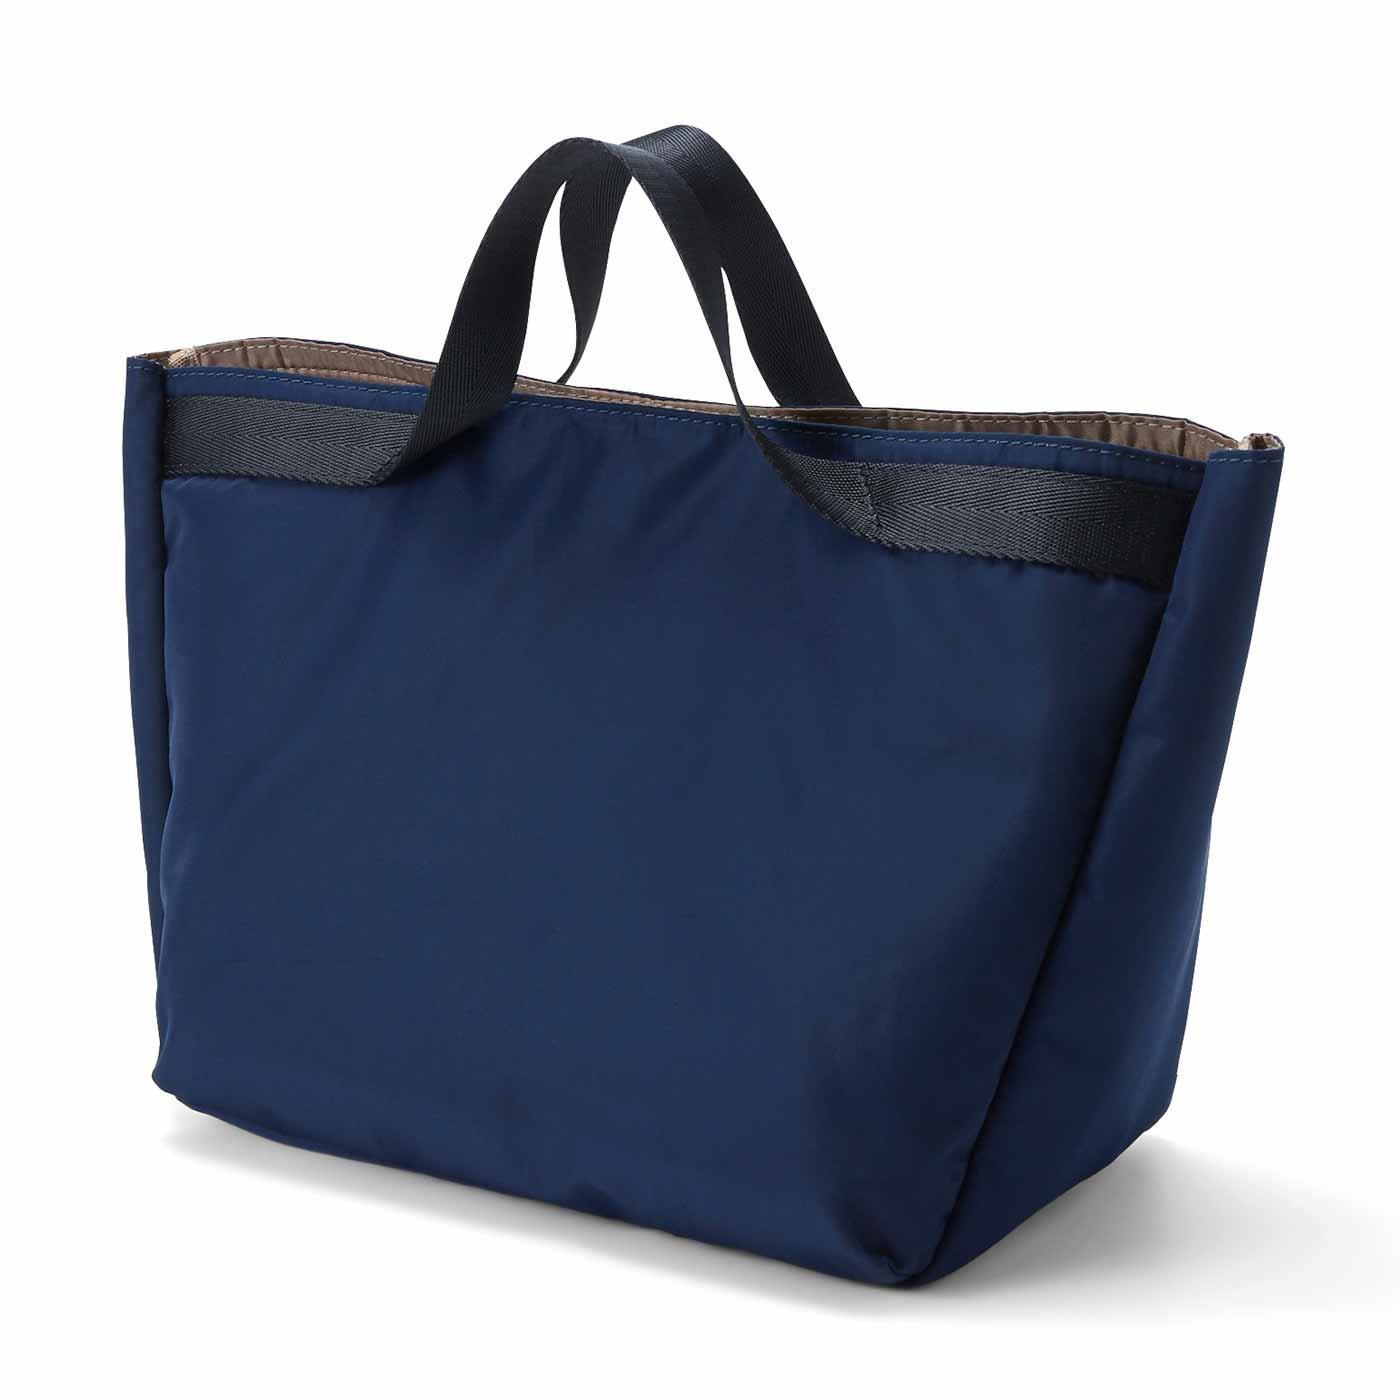 IEDIT[イディット] 取り外し可能な保冷ポーチ付きで便利な軽量トートバッグ〈ネイビー〉